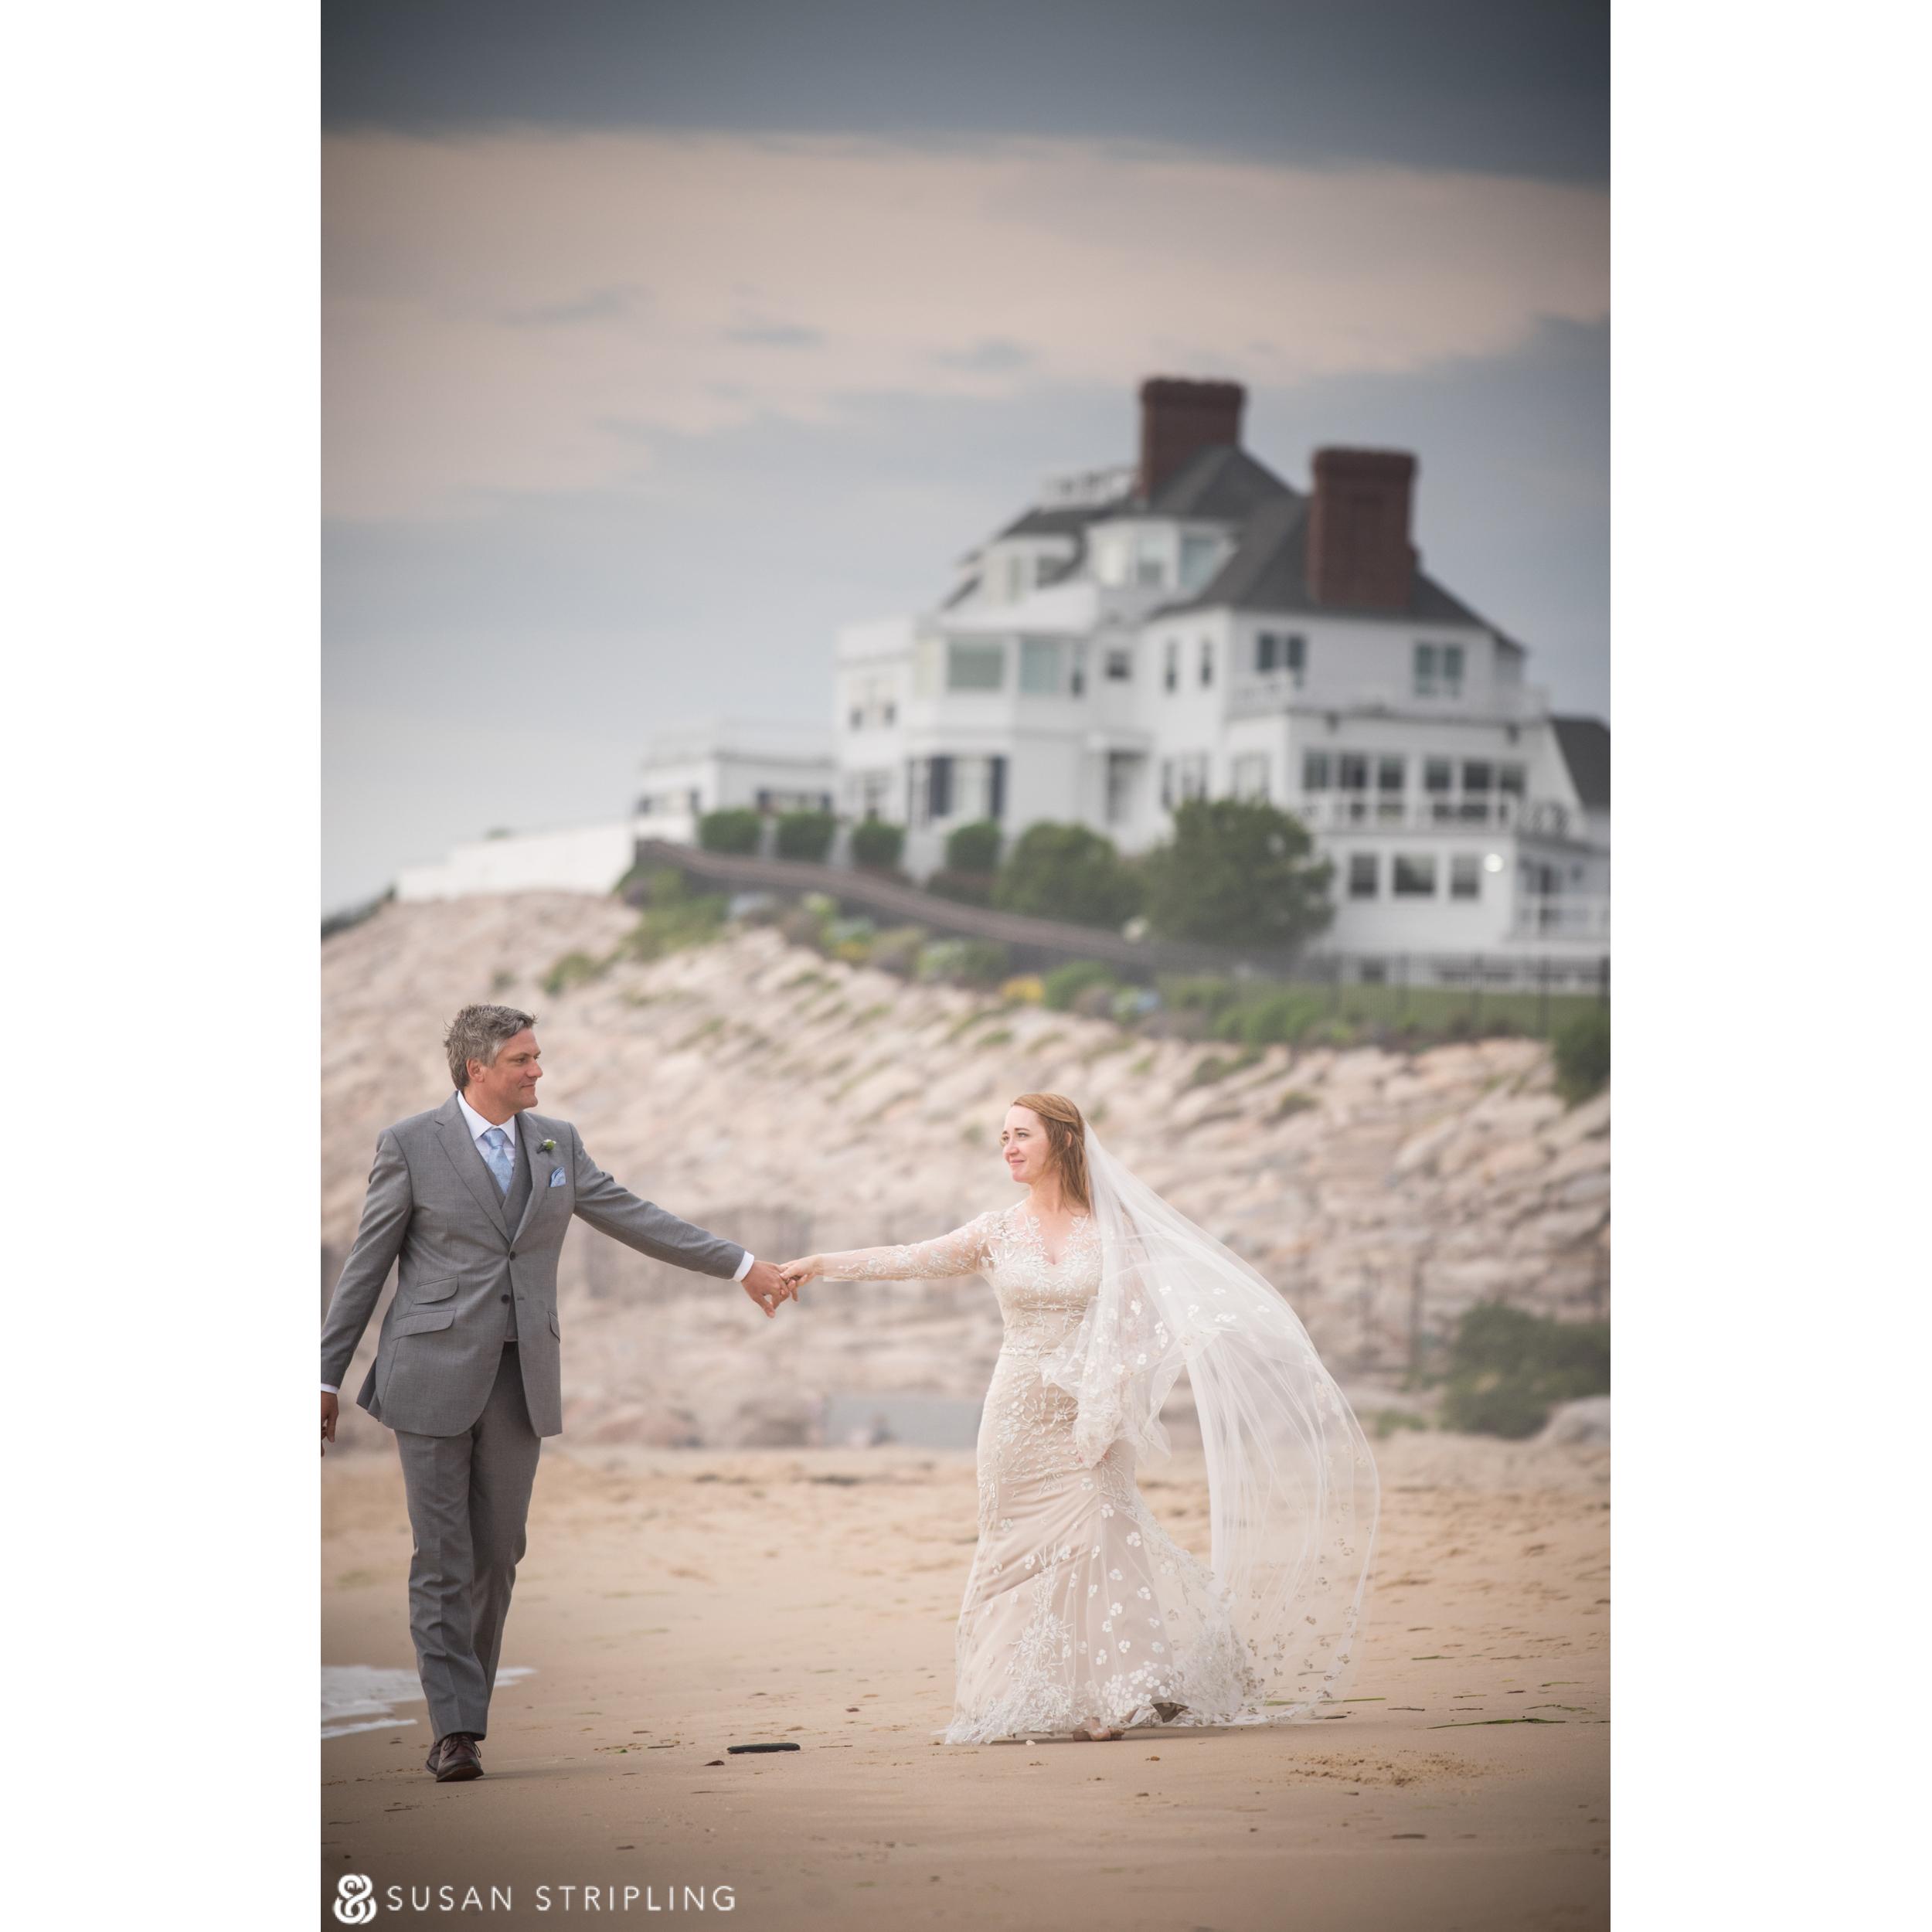 Rhode Island Wedding Photography: Susan Stripling Photography:Ocean House, Rhode Island